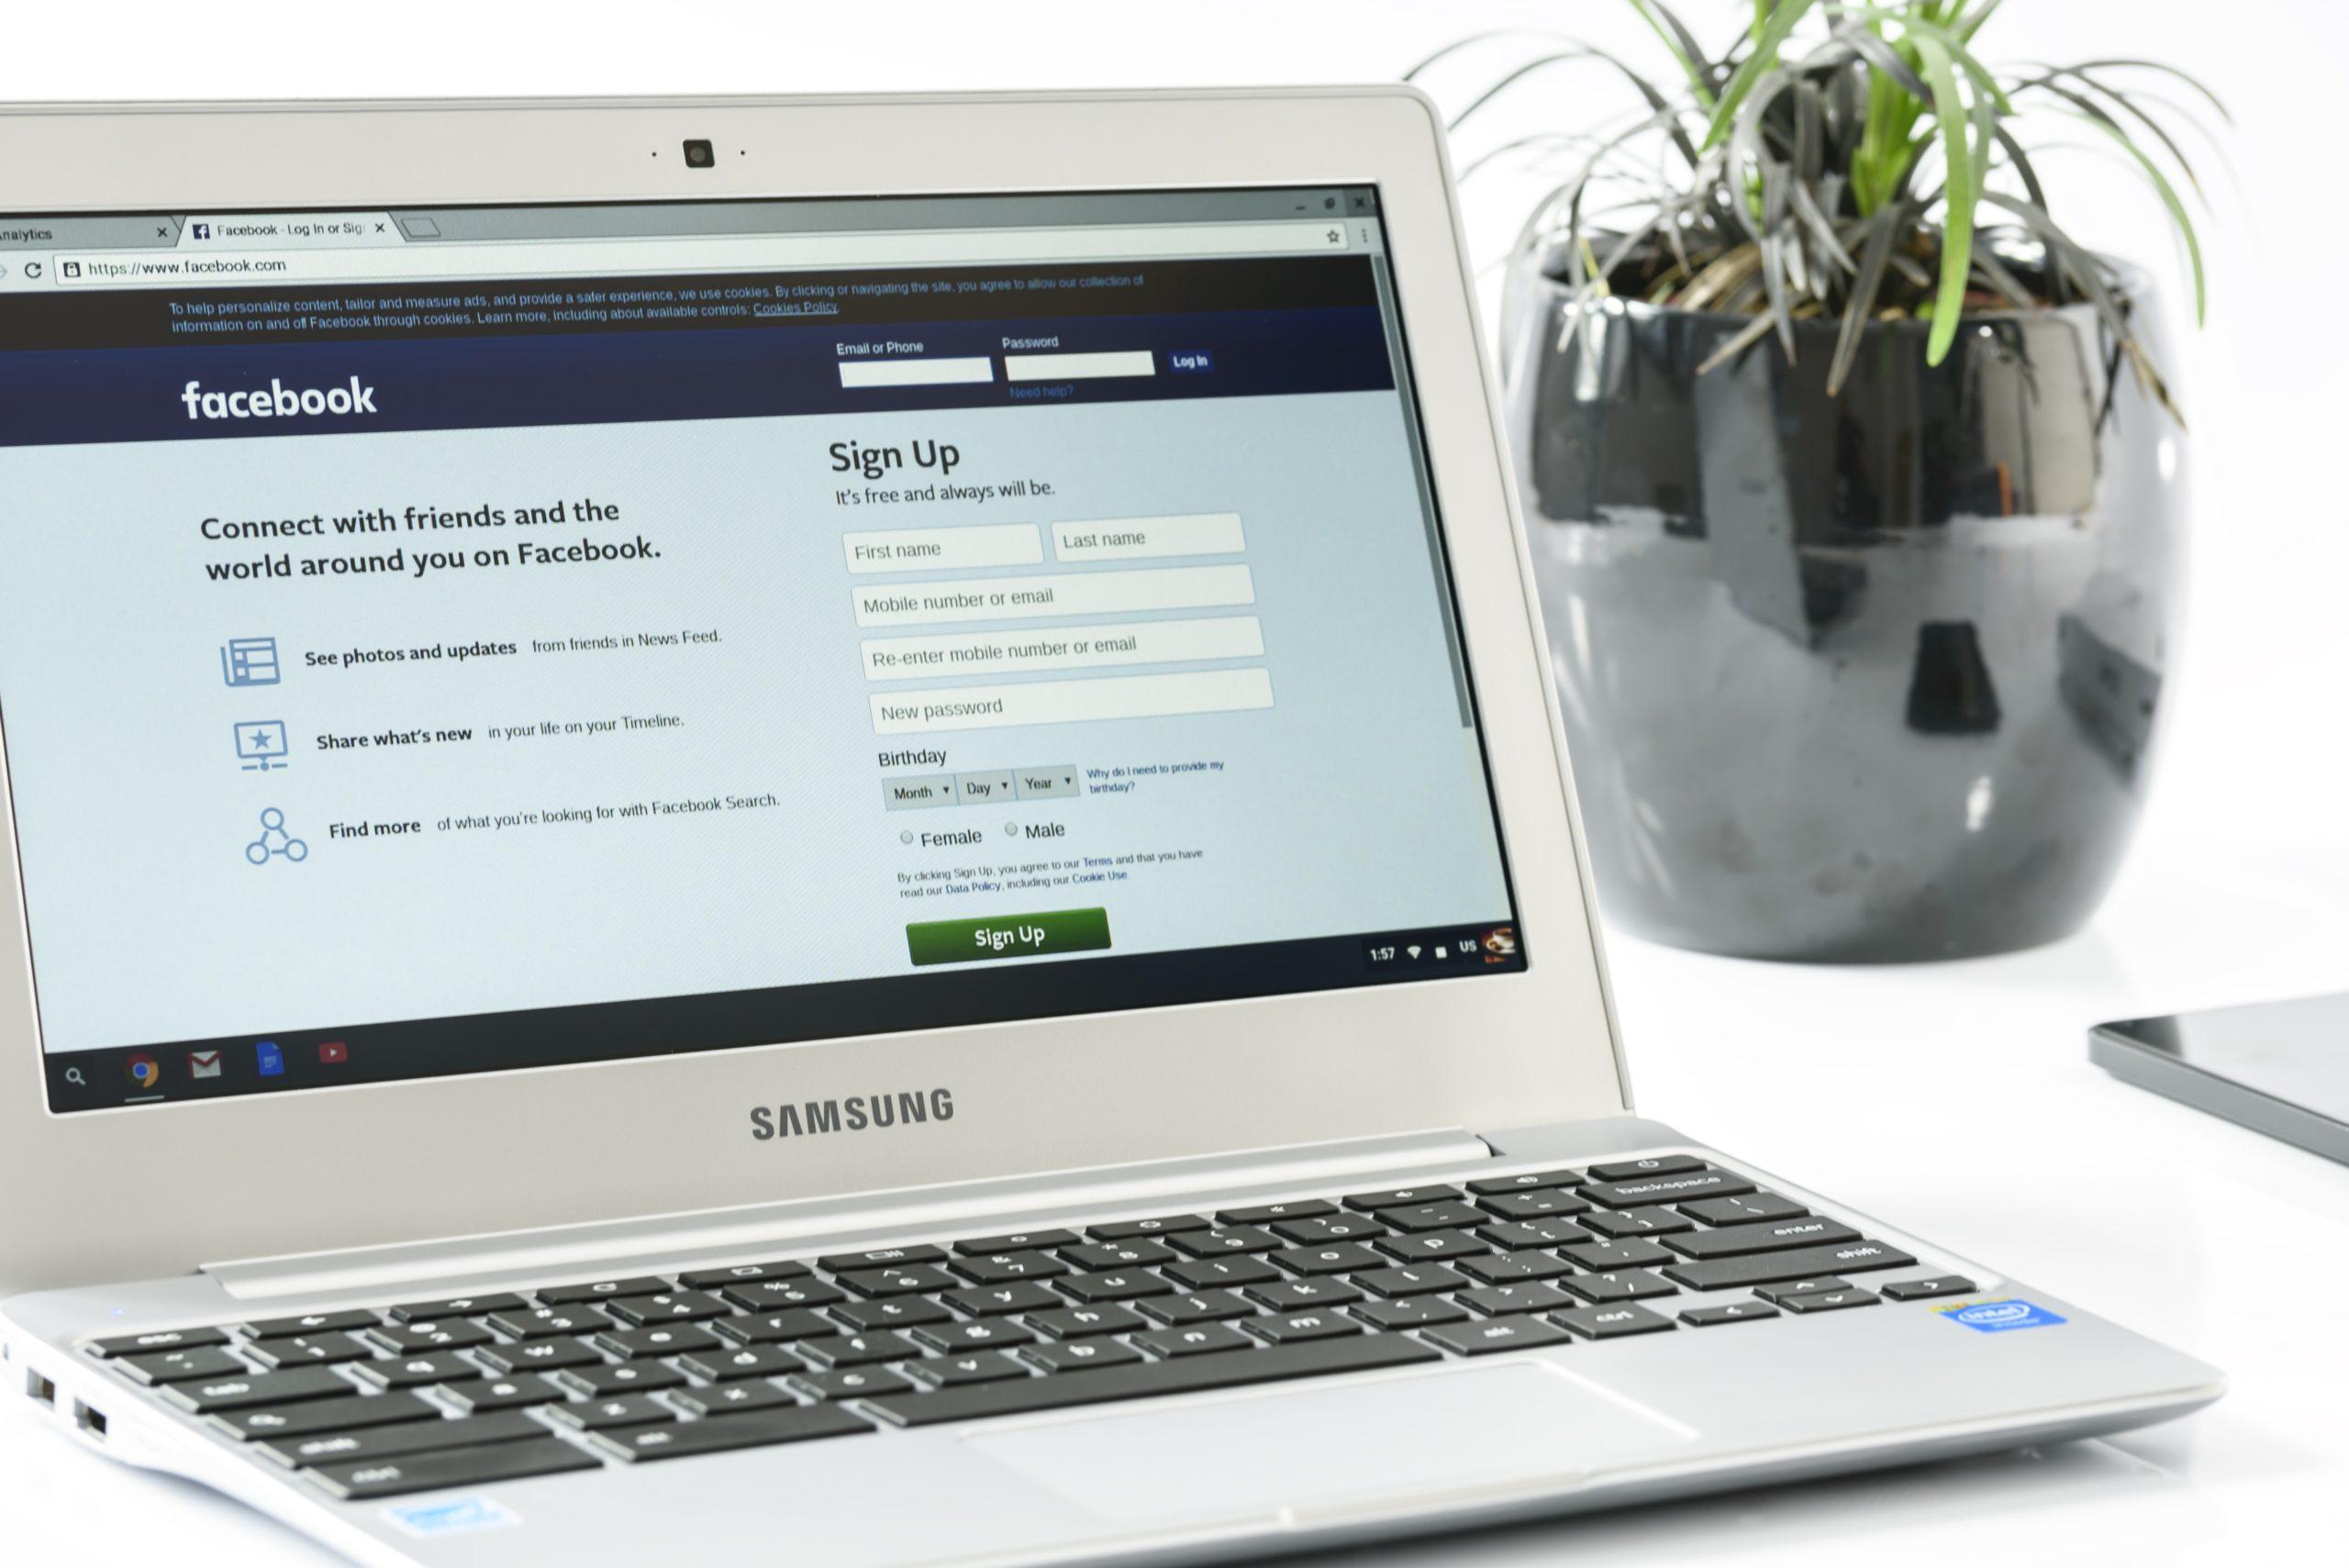 Facebook Login On Laptop Screen